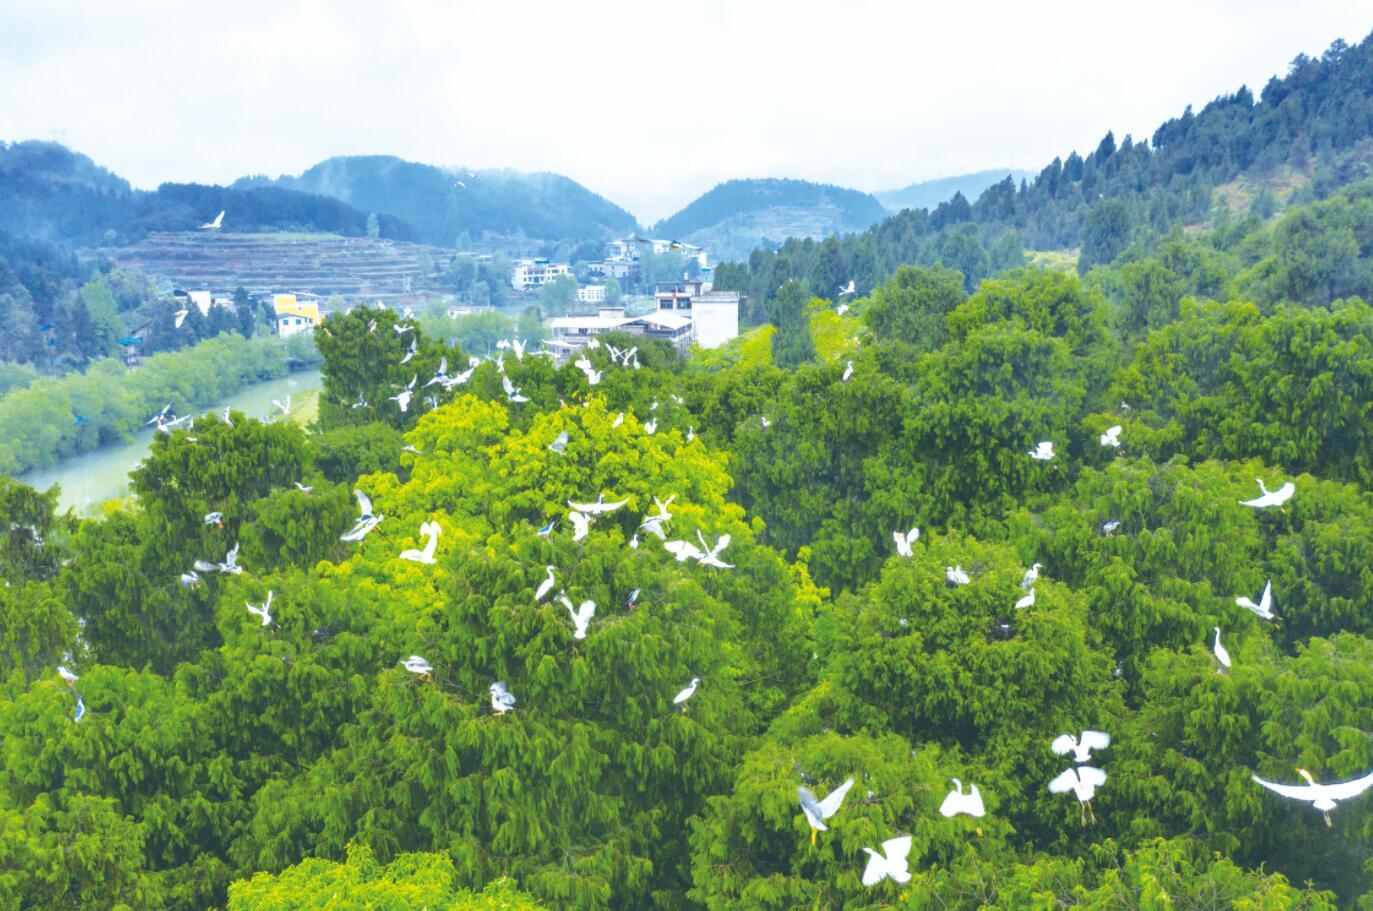 绿水青山伴鹭飞